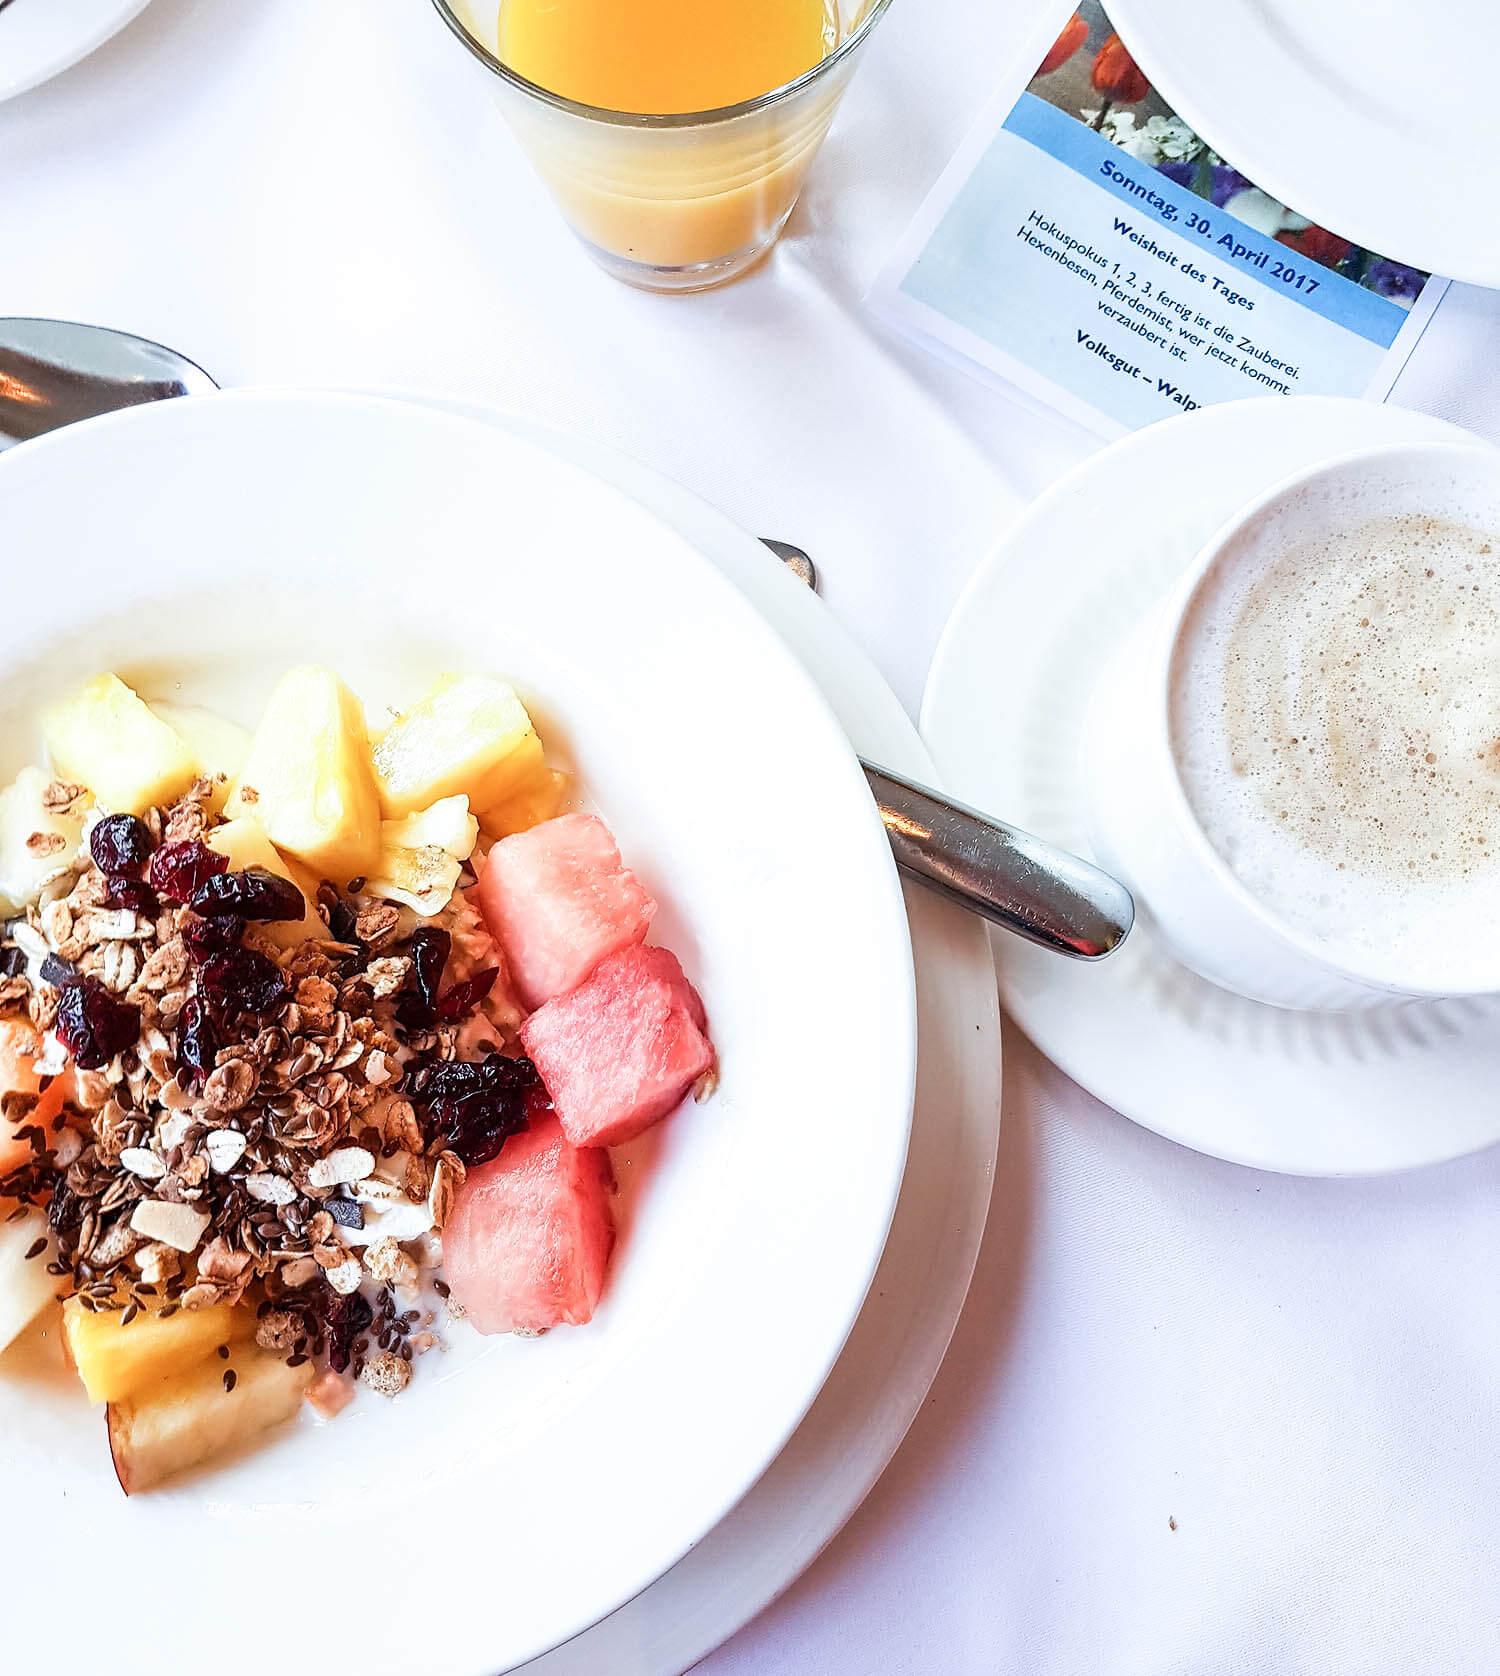 kationette-travelblog-lifestyleblog-nrw-foodblog-Culinary-Adventures-Bad-Driburg